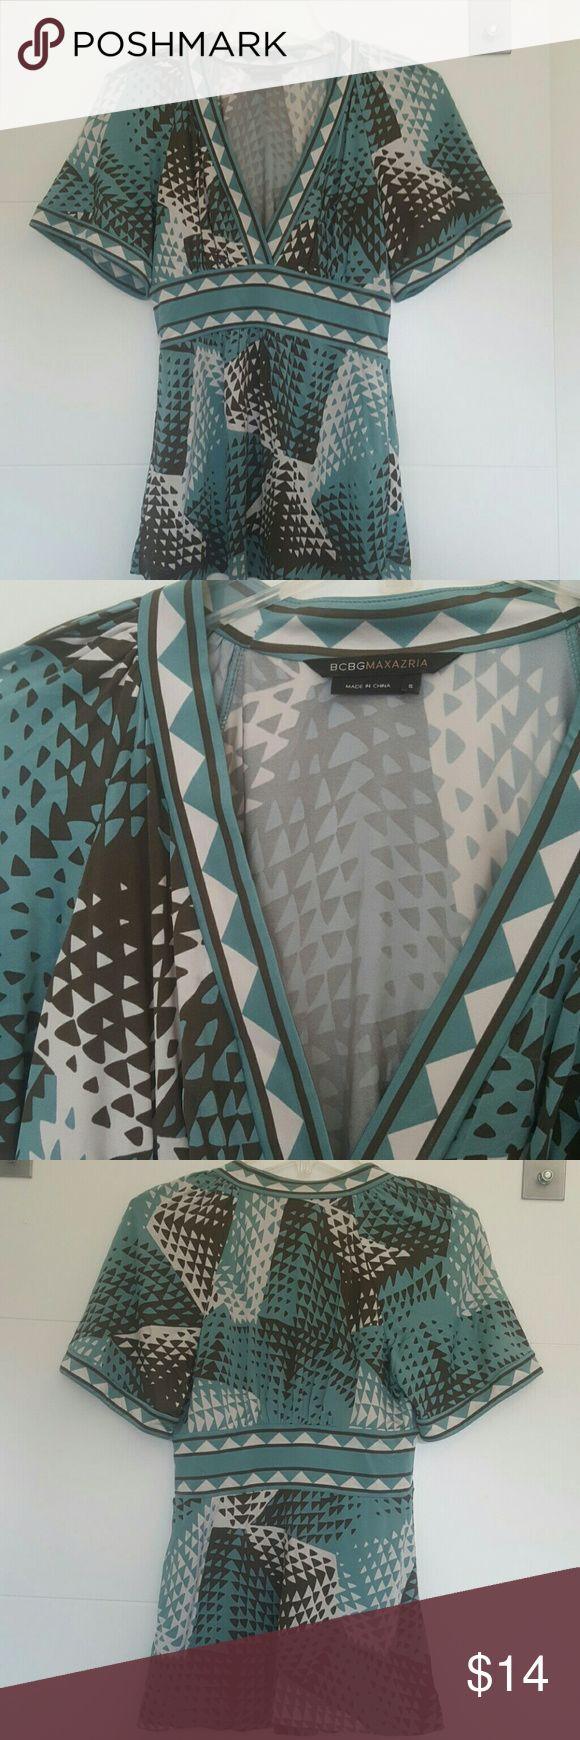 BCBGMAXAZRIA TOP 93% rayon  7% spandex  40 bust  26 length  13 sleeve BCBGMaxAzria Tops